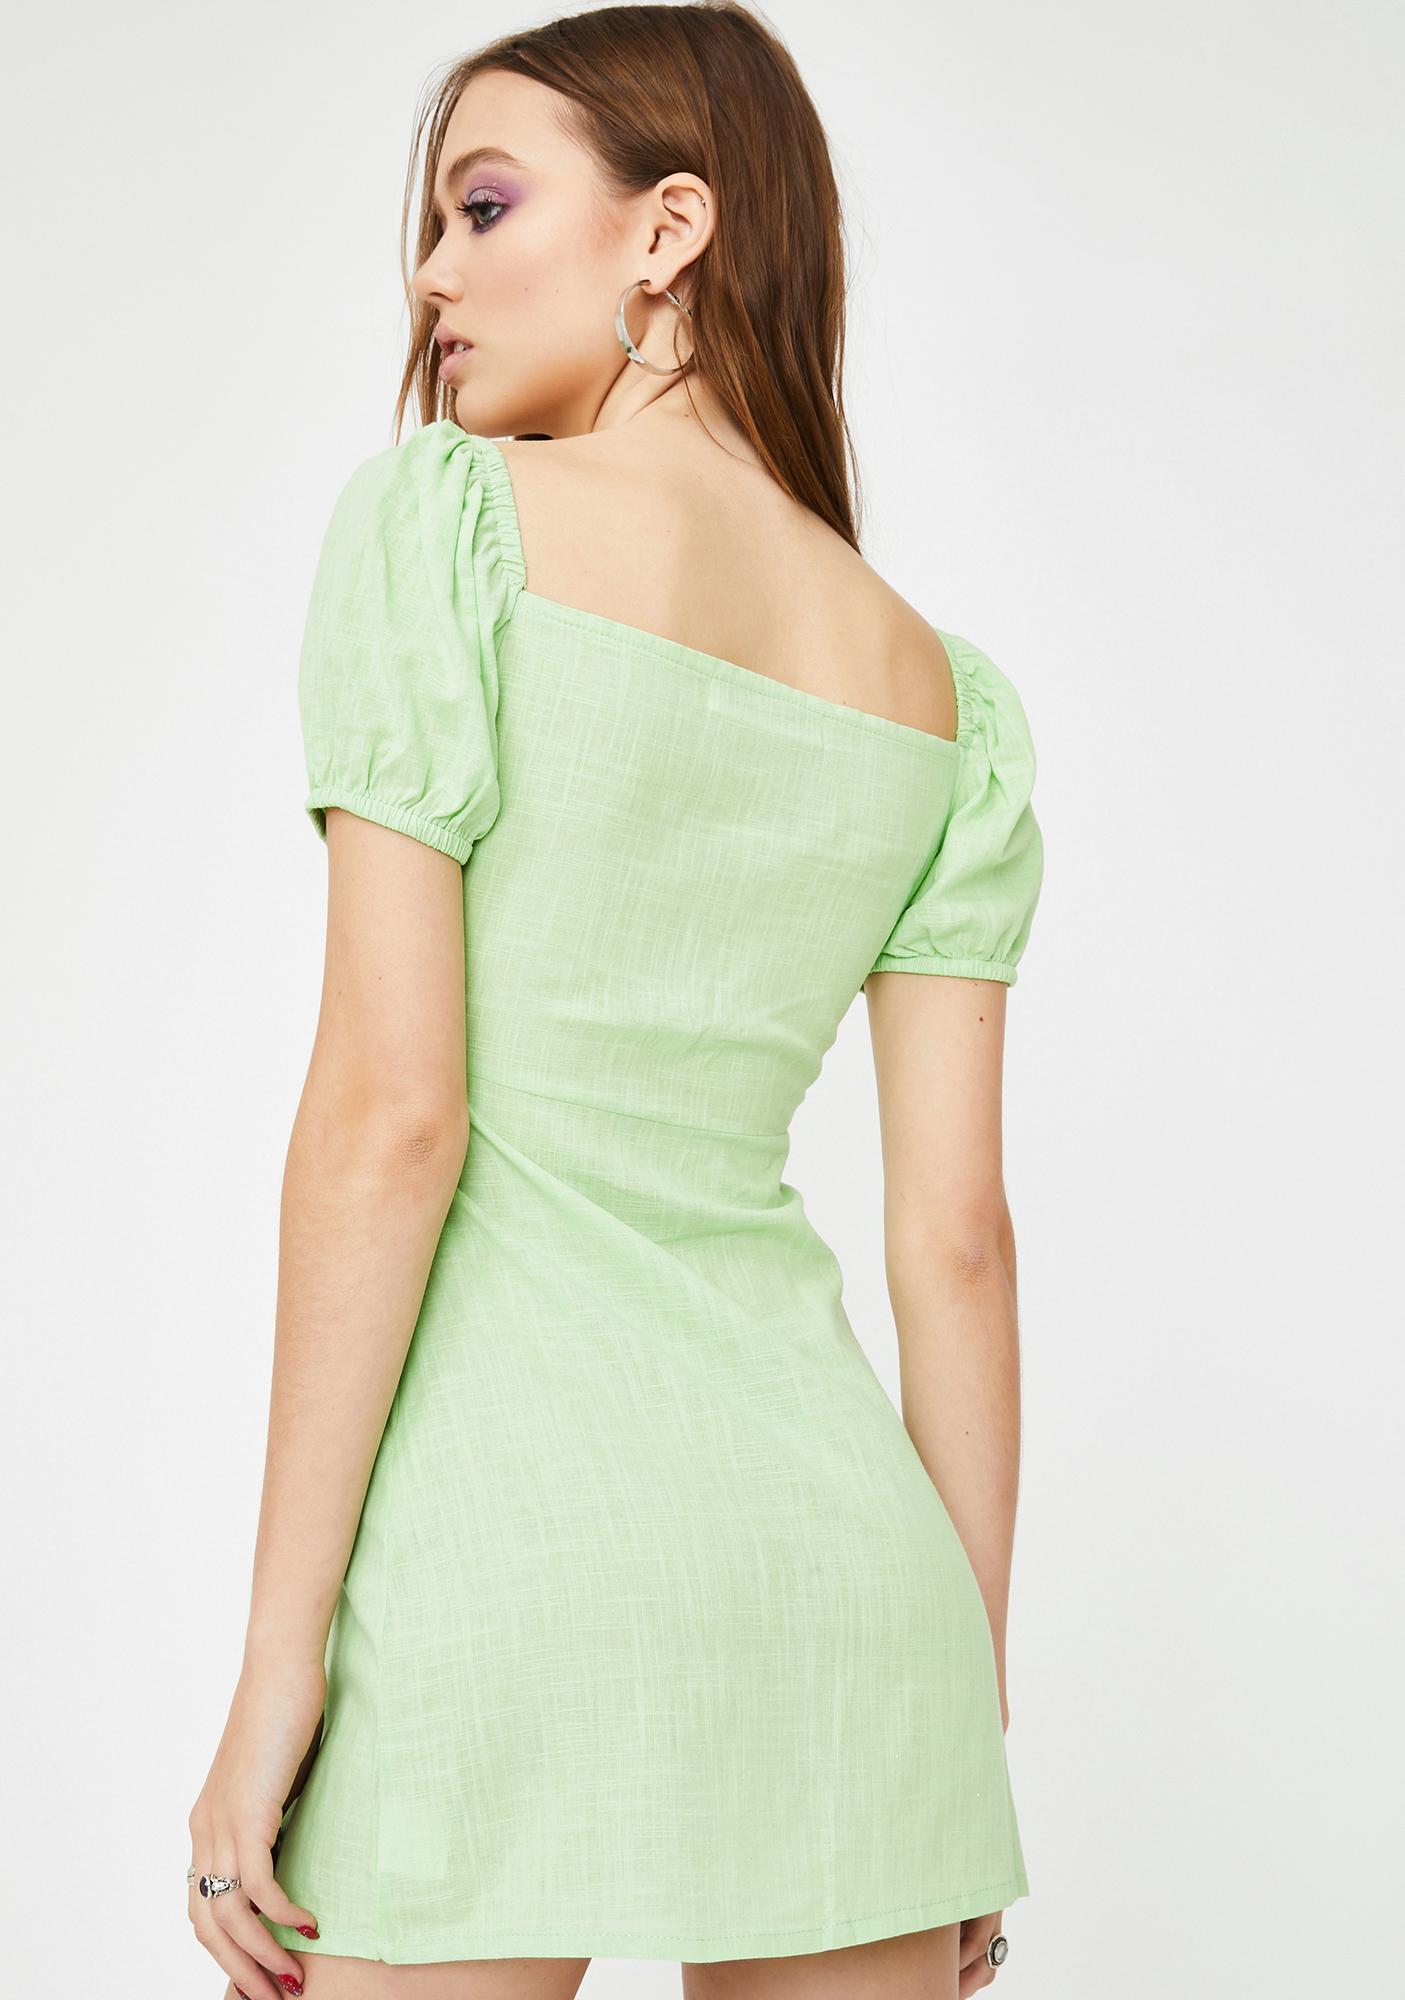 ZEMETA Green Pea Mini Dress